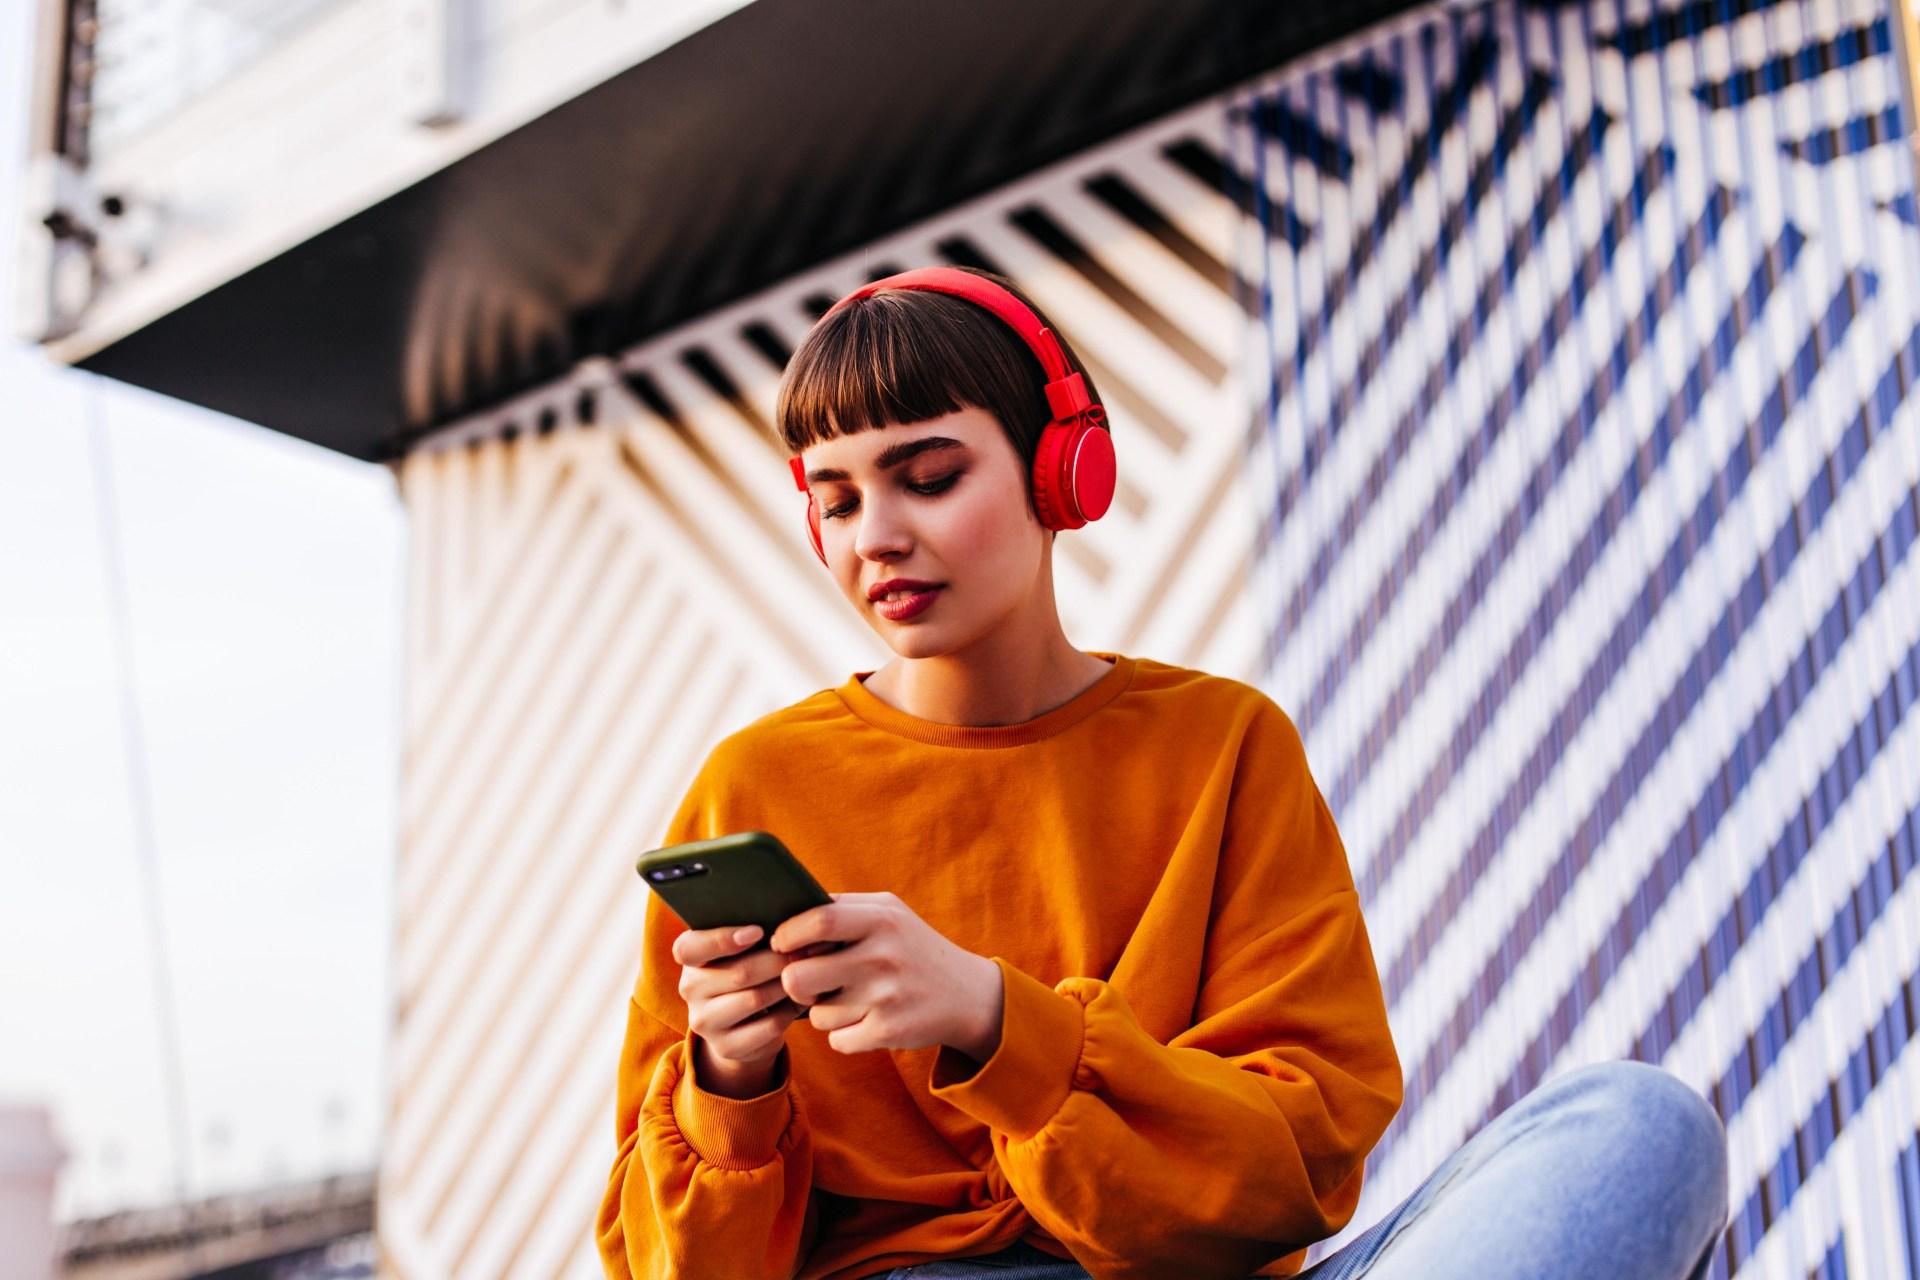 teen girl listening to music